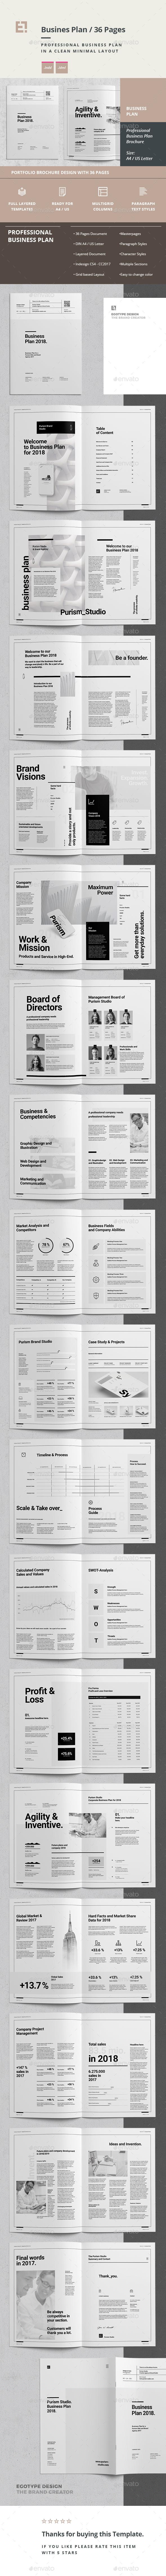 GraphicRiver Business Plan 20872294